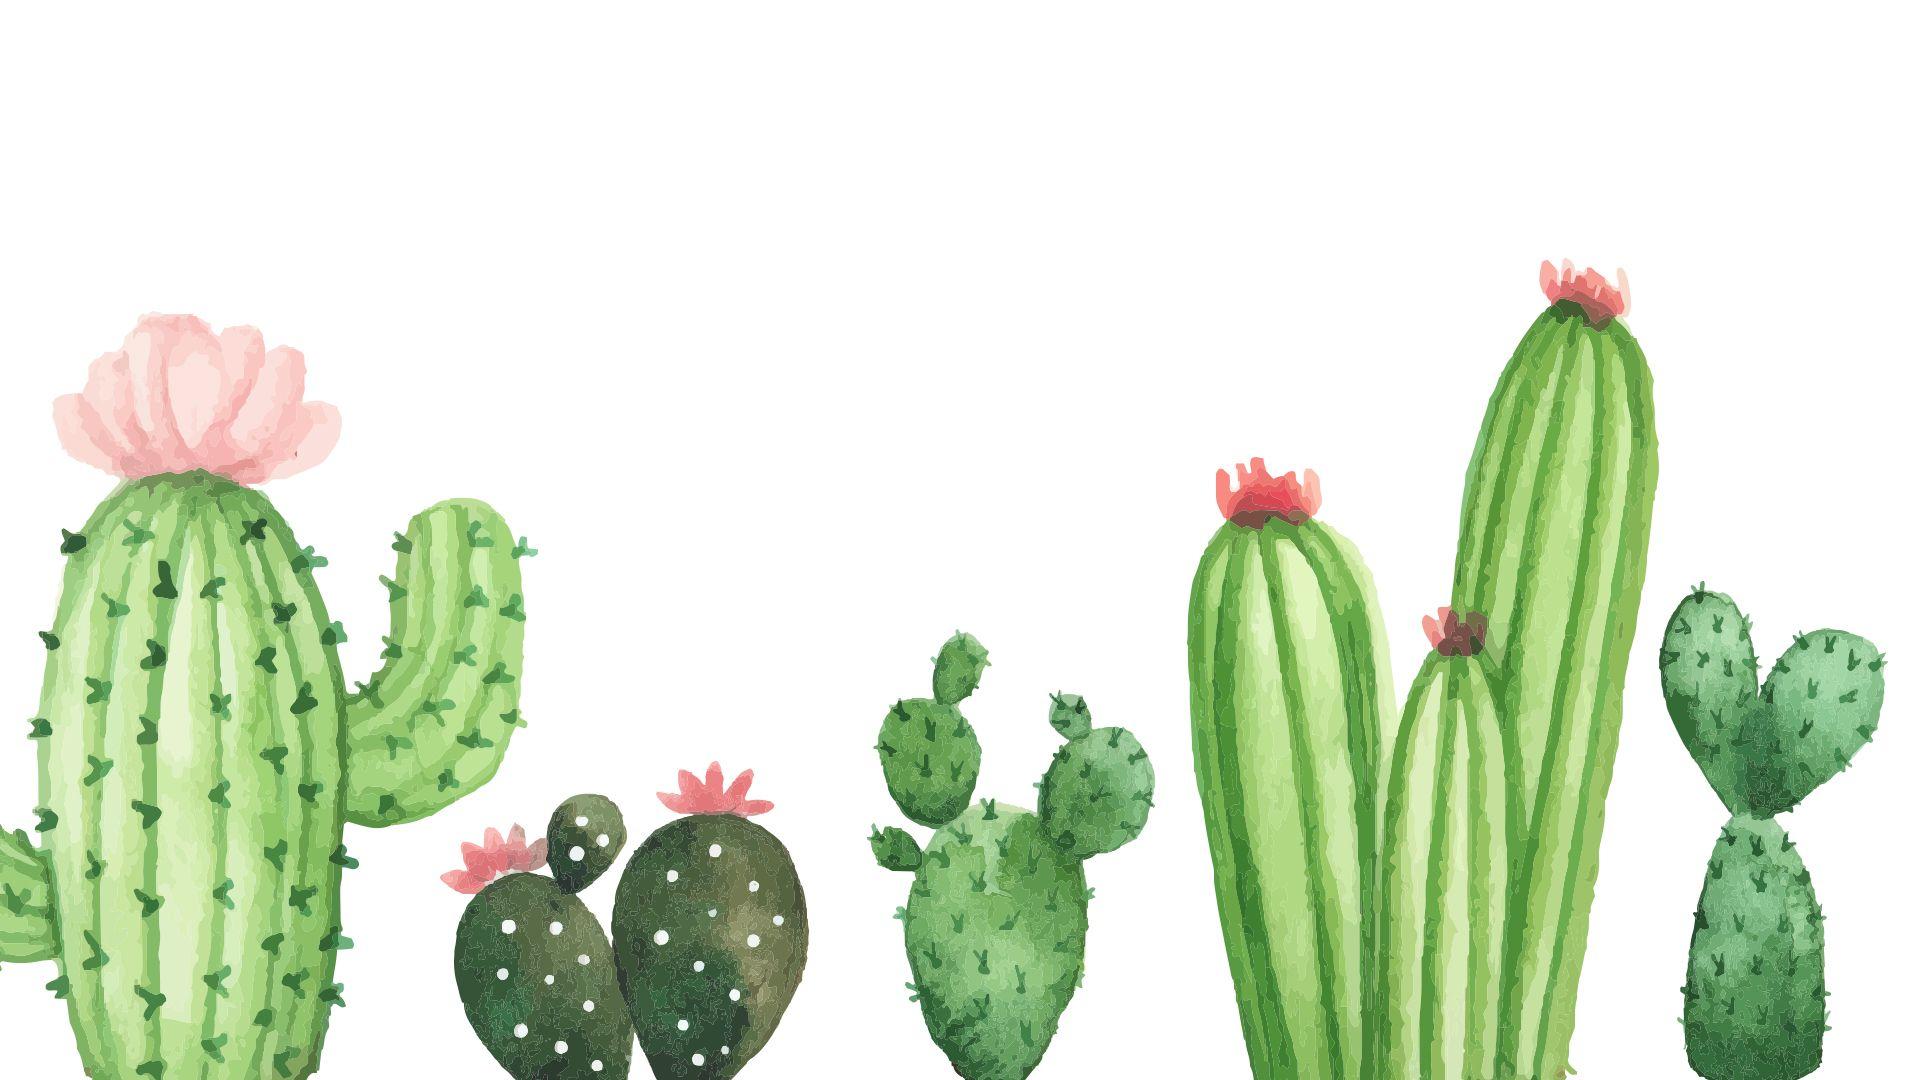 Cactus Wallpaper For Computer Watercolor Desktop Wallpaper Computer Wallpaper Desktop Wallpapers Plant Wallpaper